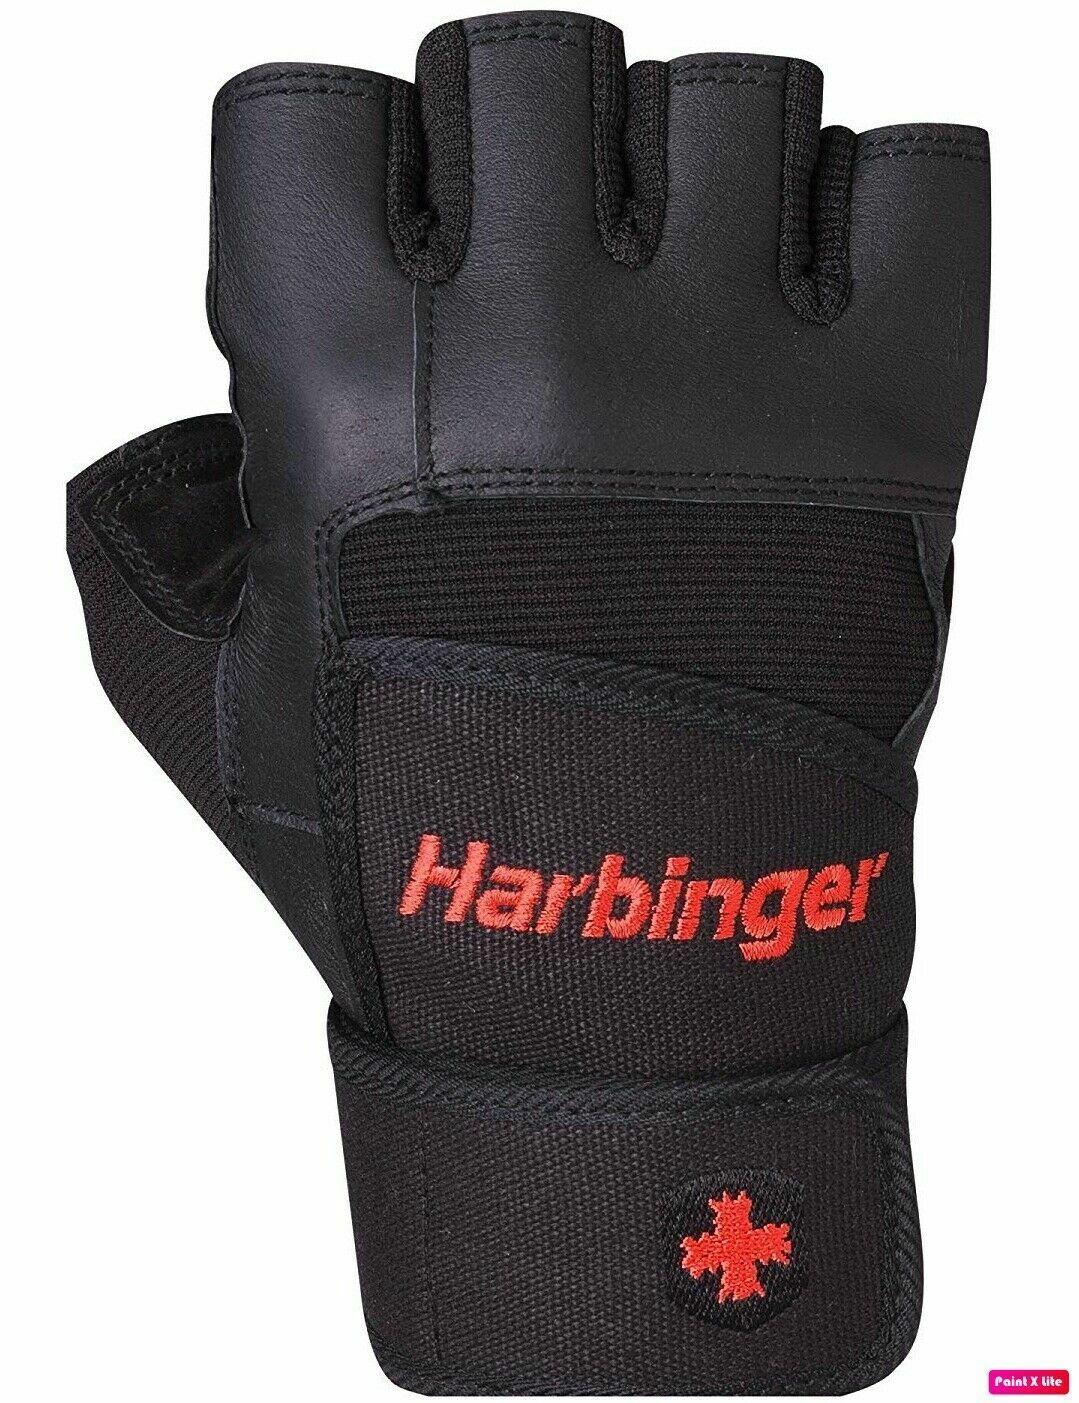 NWOT Harbinger Wristwrap Pro Gloves Weight Lifting Gym Wrist